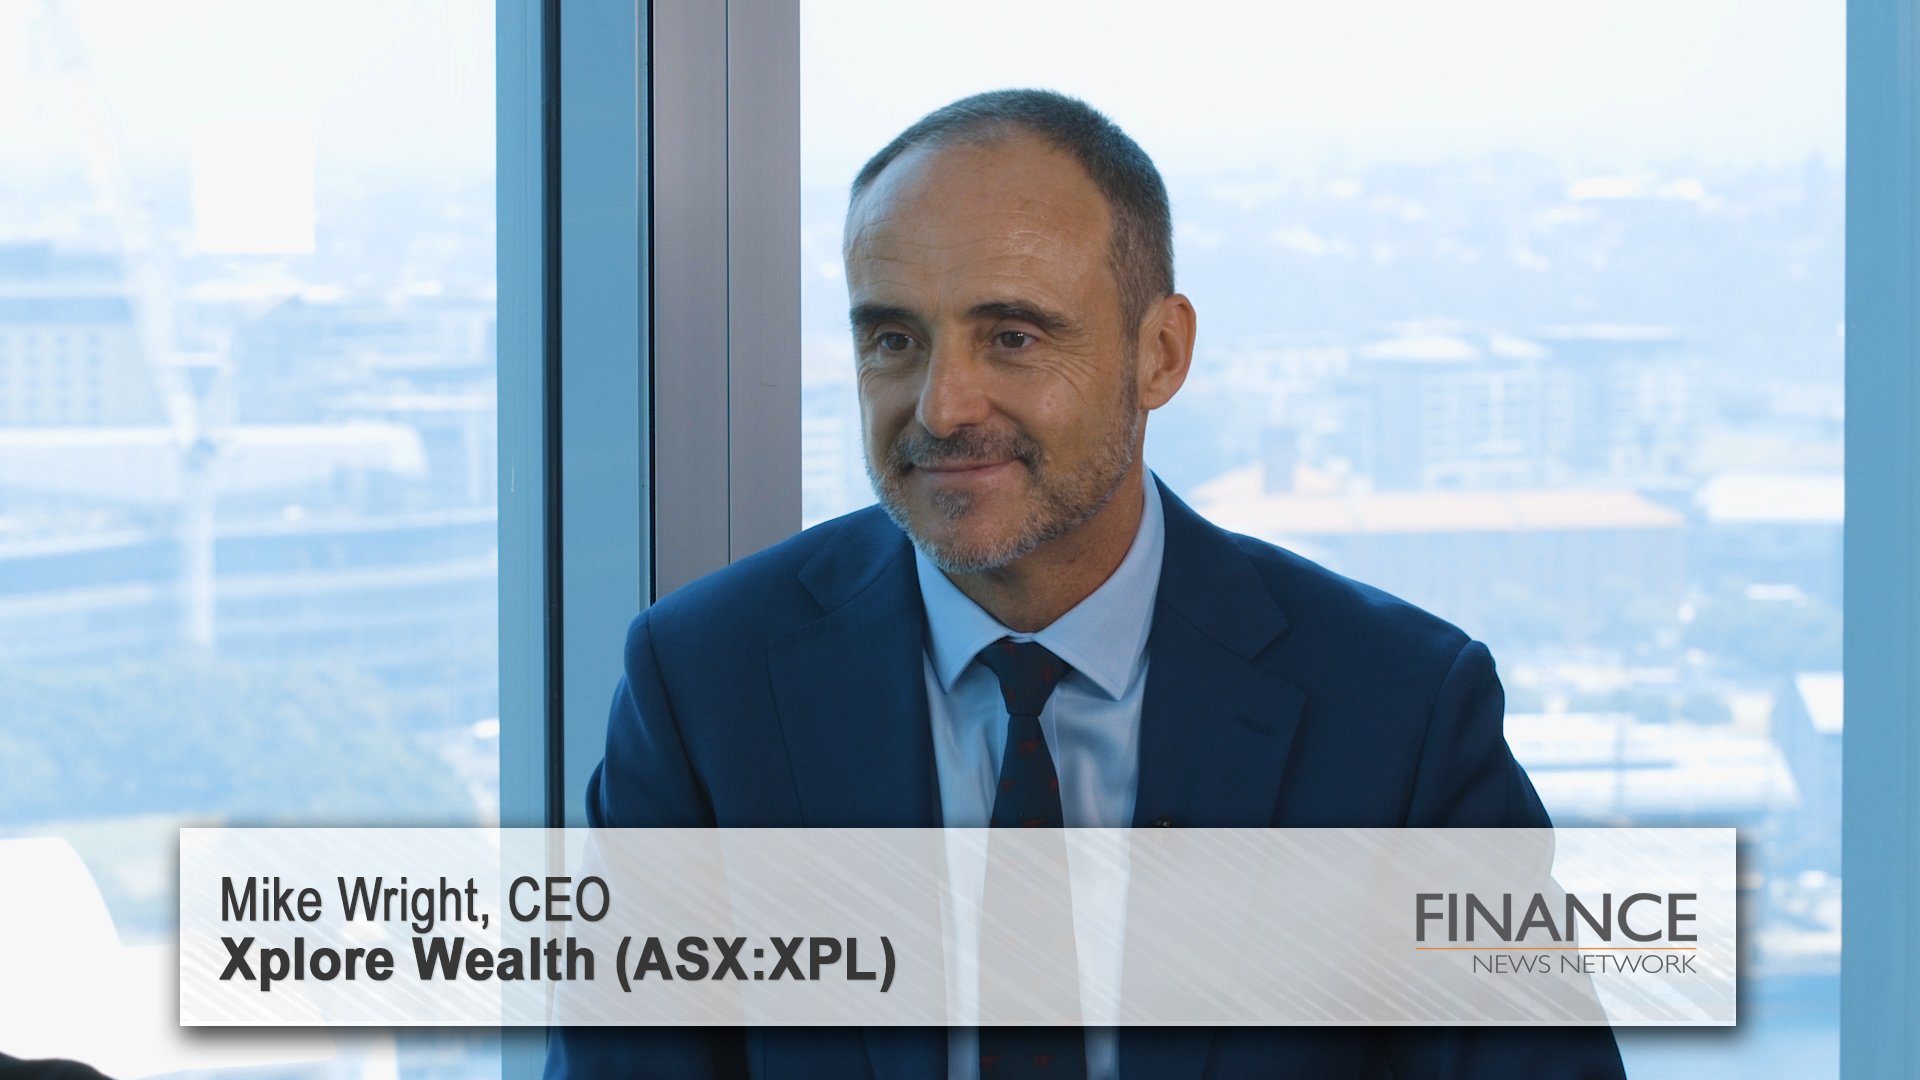 Xplore Wealth (ASX:XPL) - independent platform provider